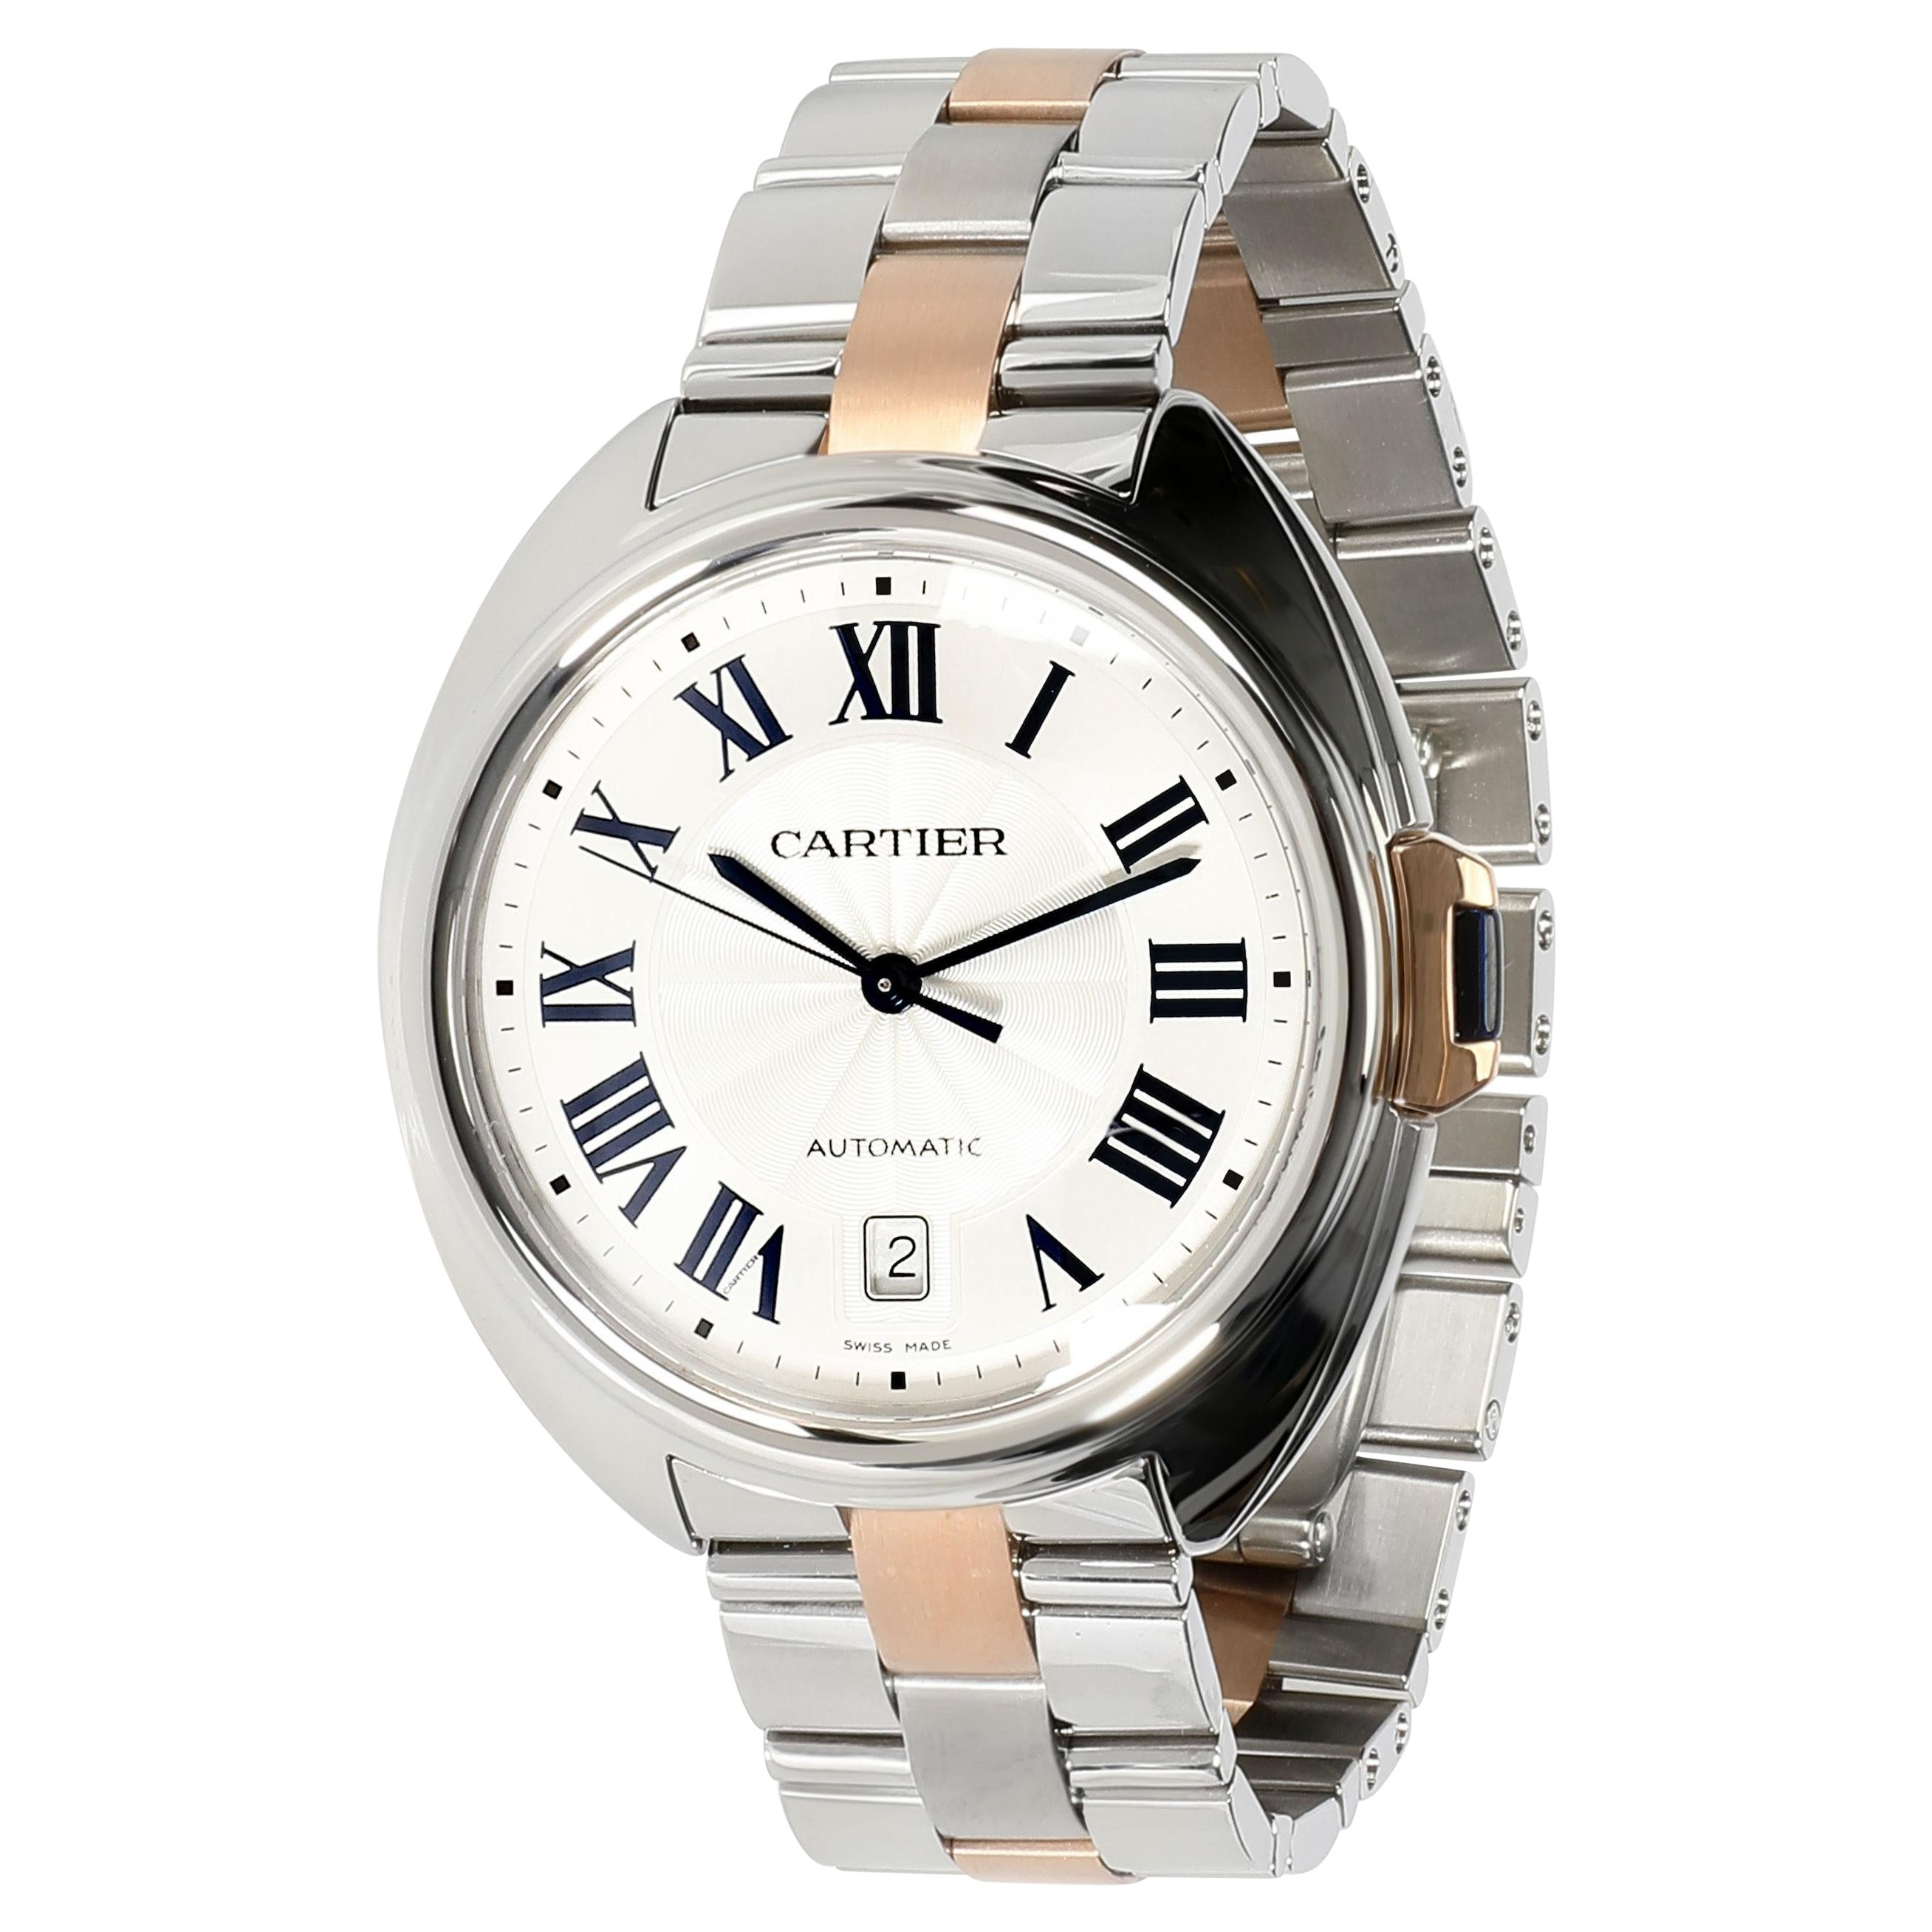 Cartier Cle de Cartier W2CL0002 Men's Watch in 18kt Stainless Steel/Rose Gold